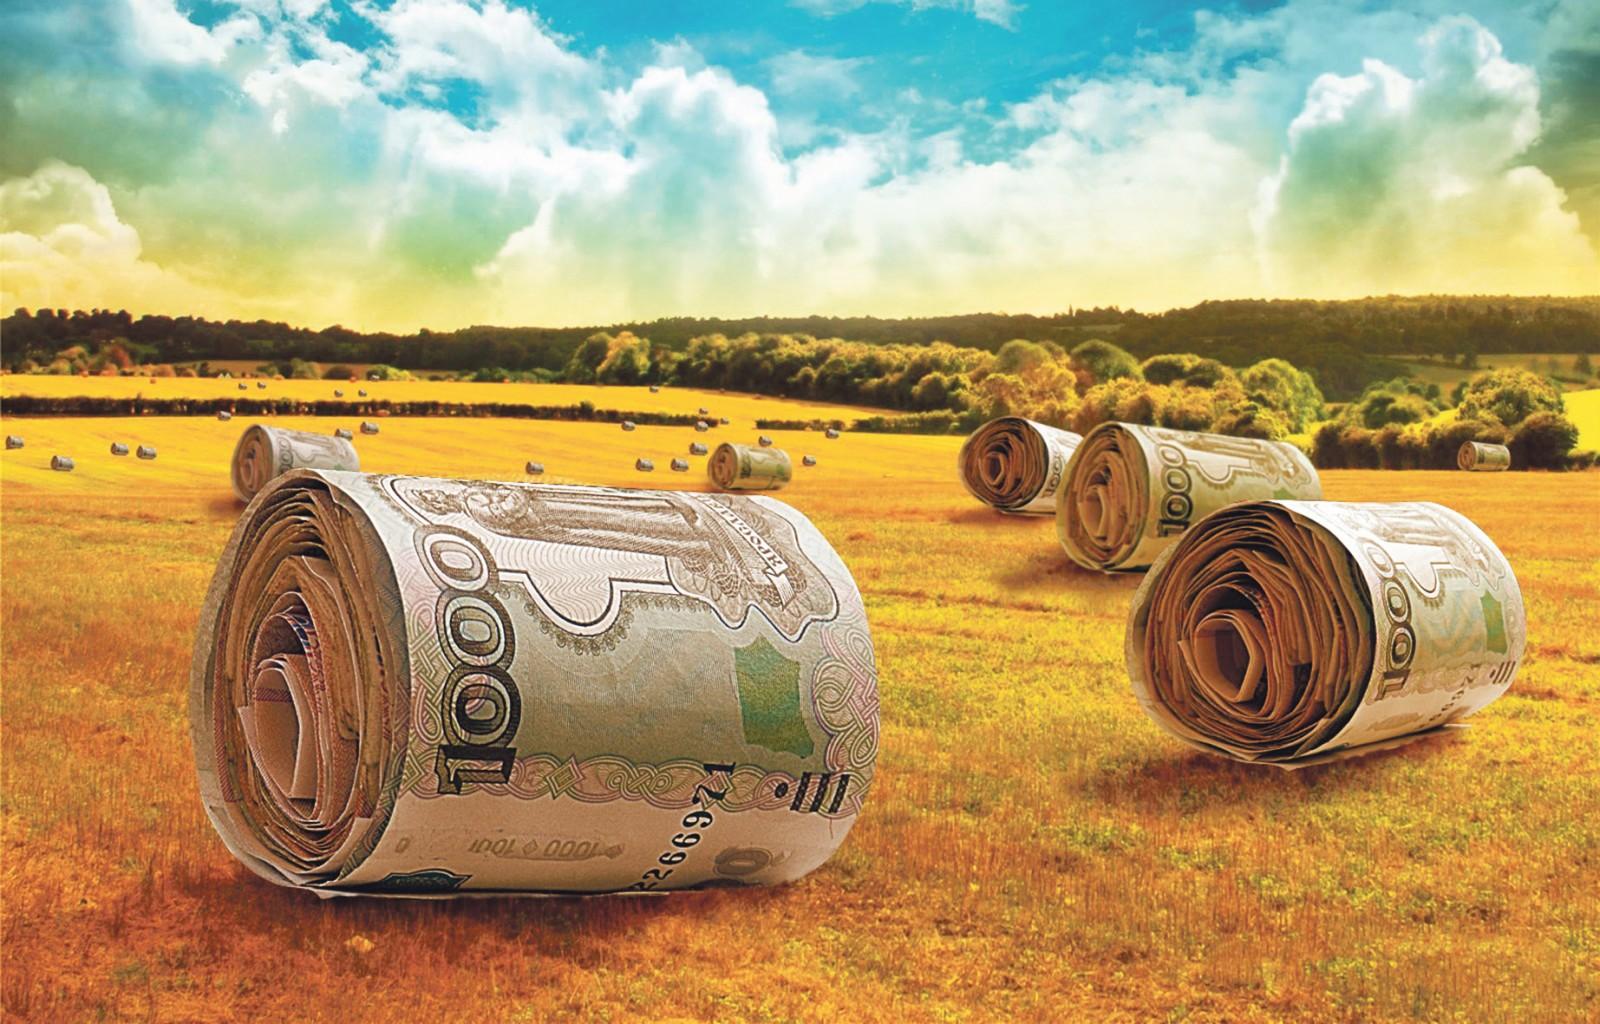 Банк хоум кредит г владимир